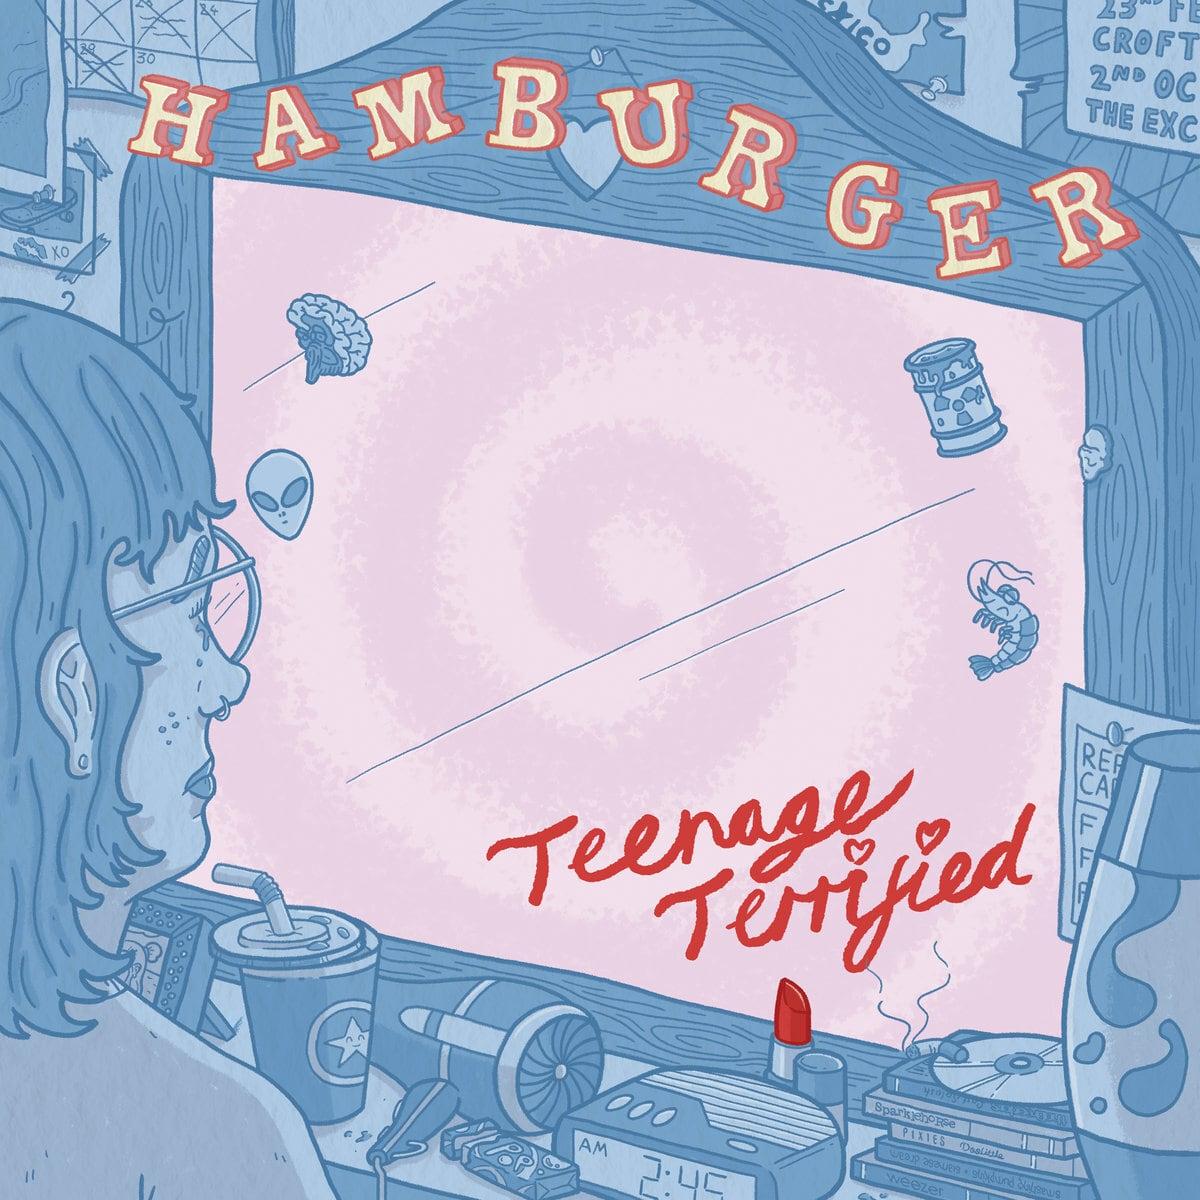 hamburger / Teenage Terrified(300 Ltd LP)